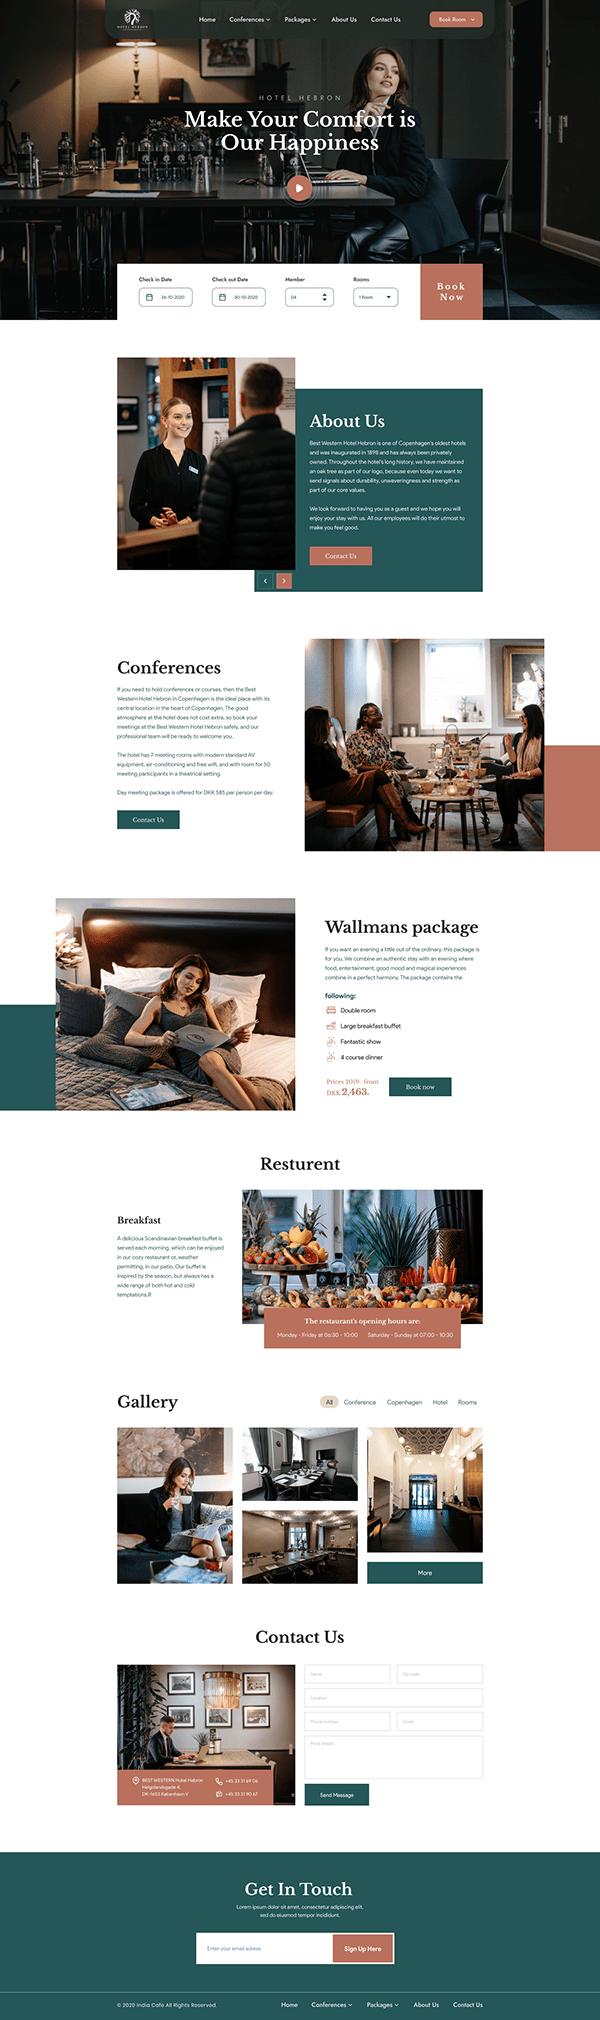 Hotel landing page design